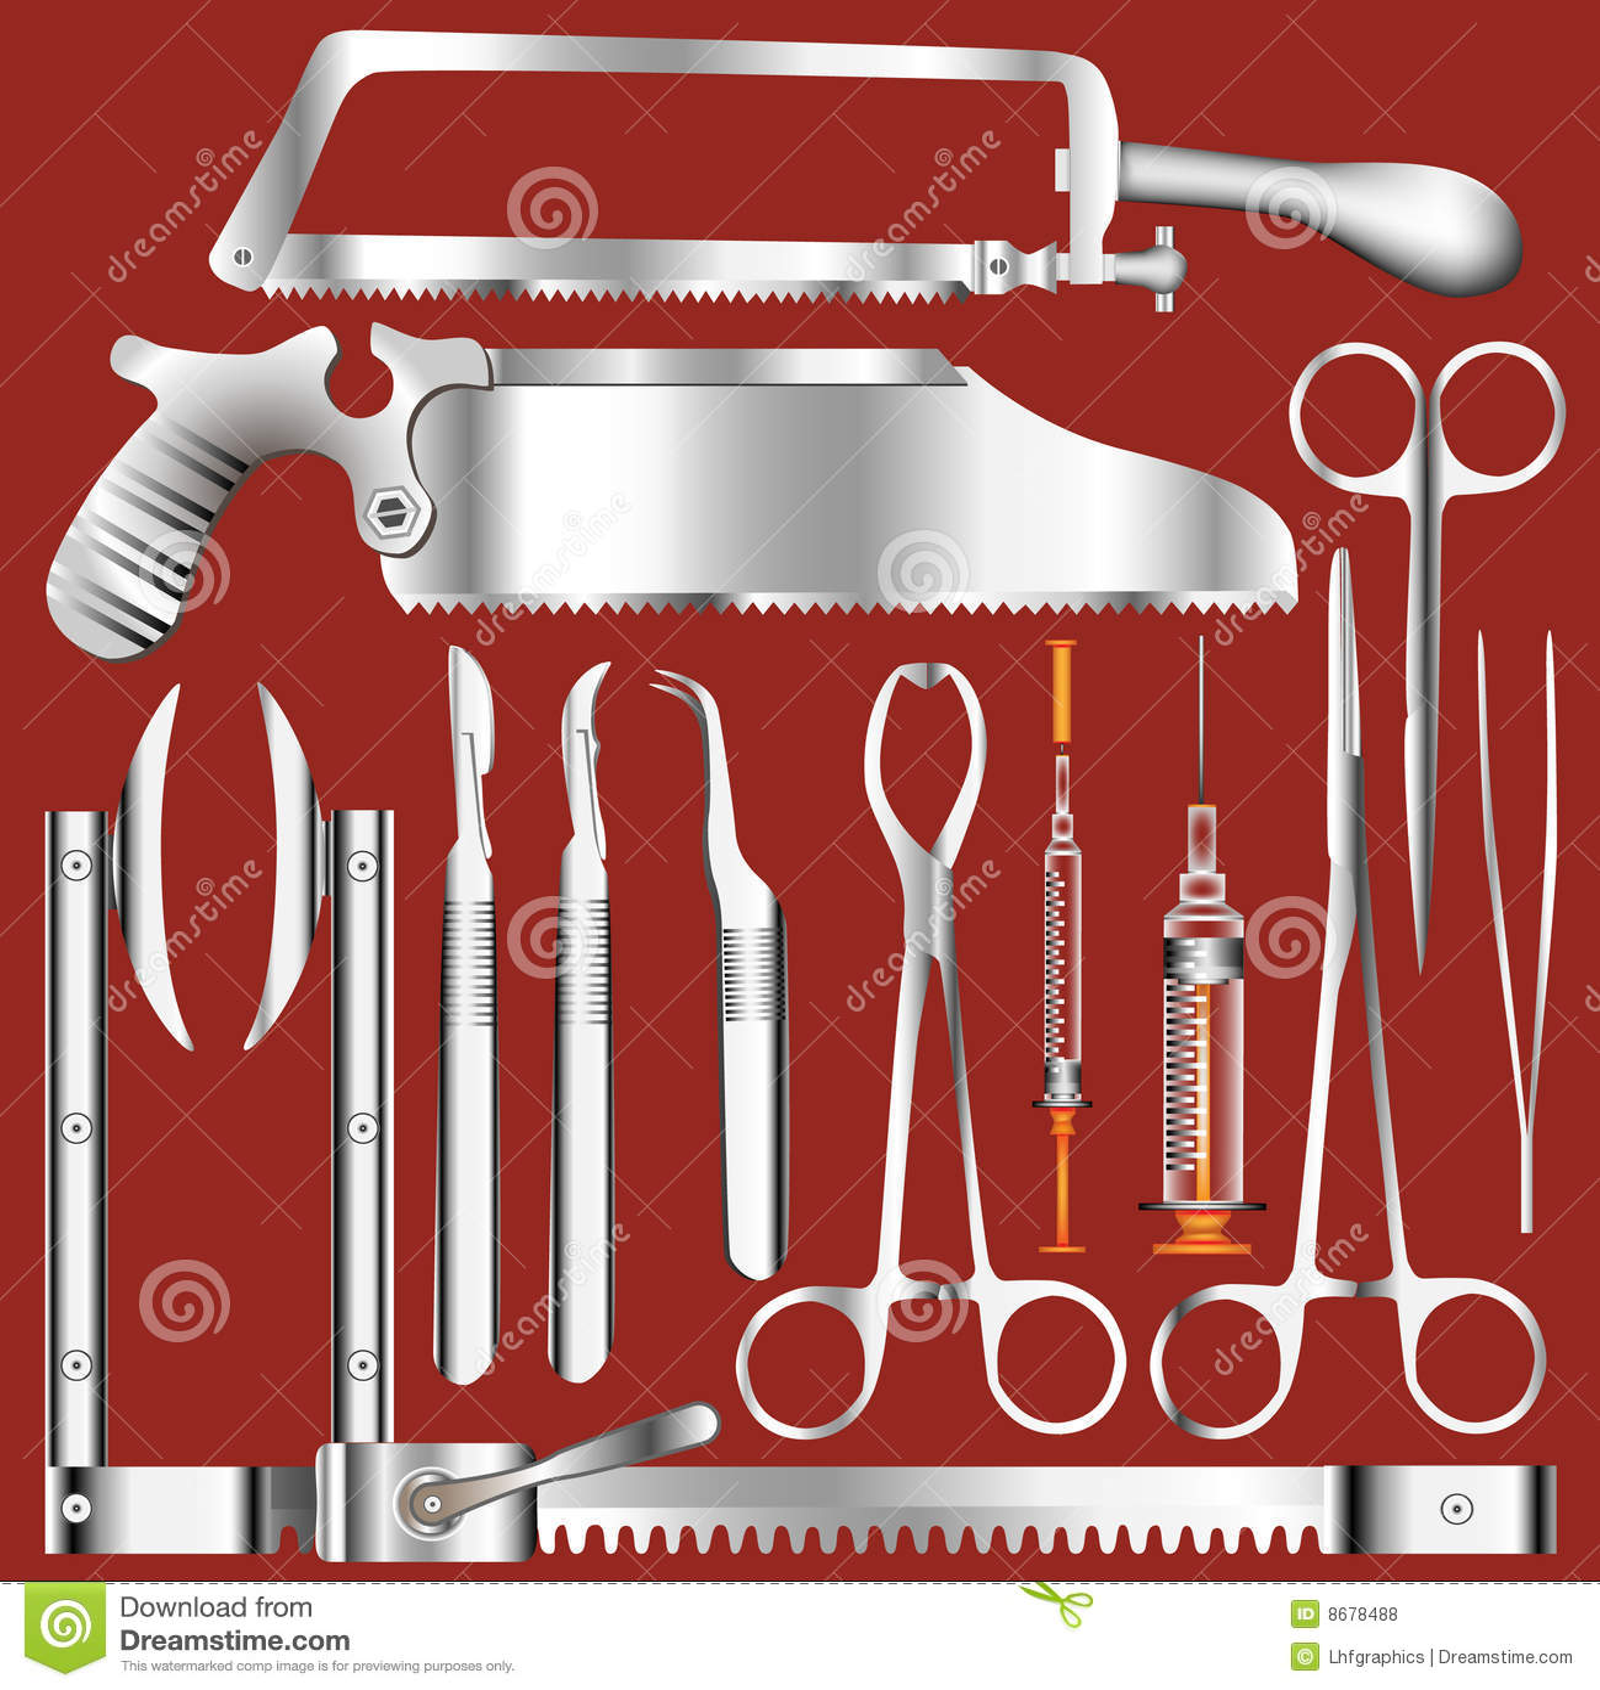 Surgery Tools Royalty Free Stock Photos - Image: 8678488